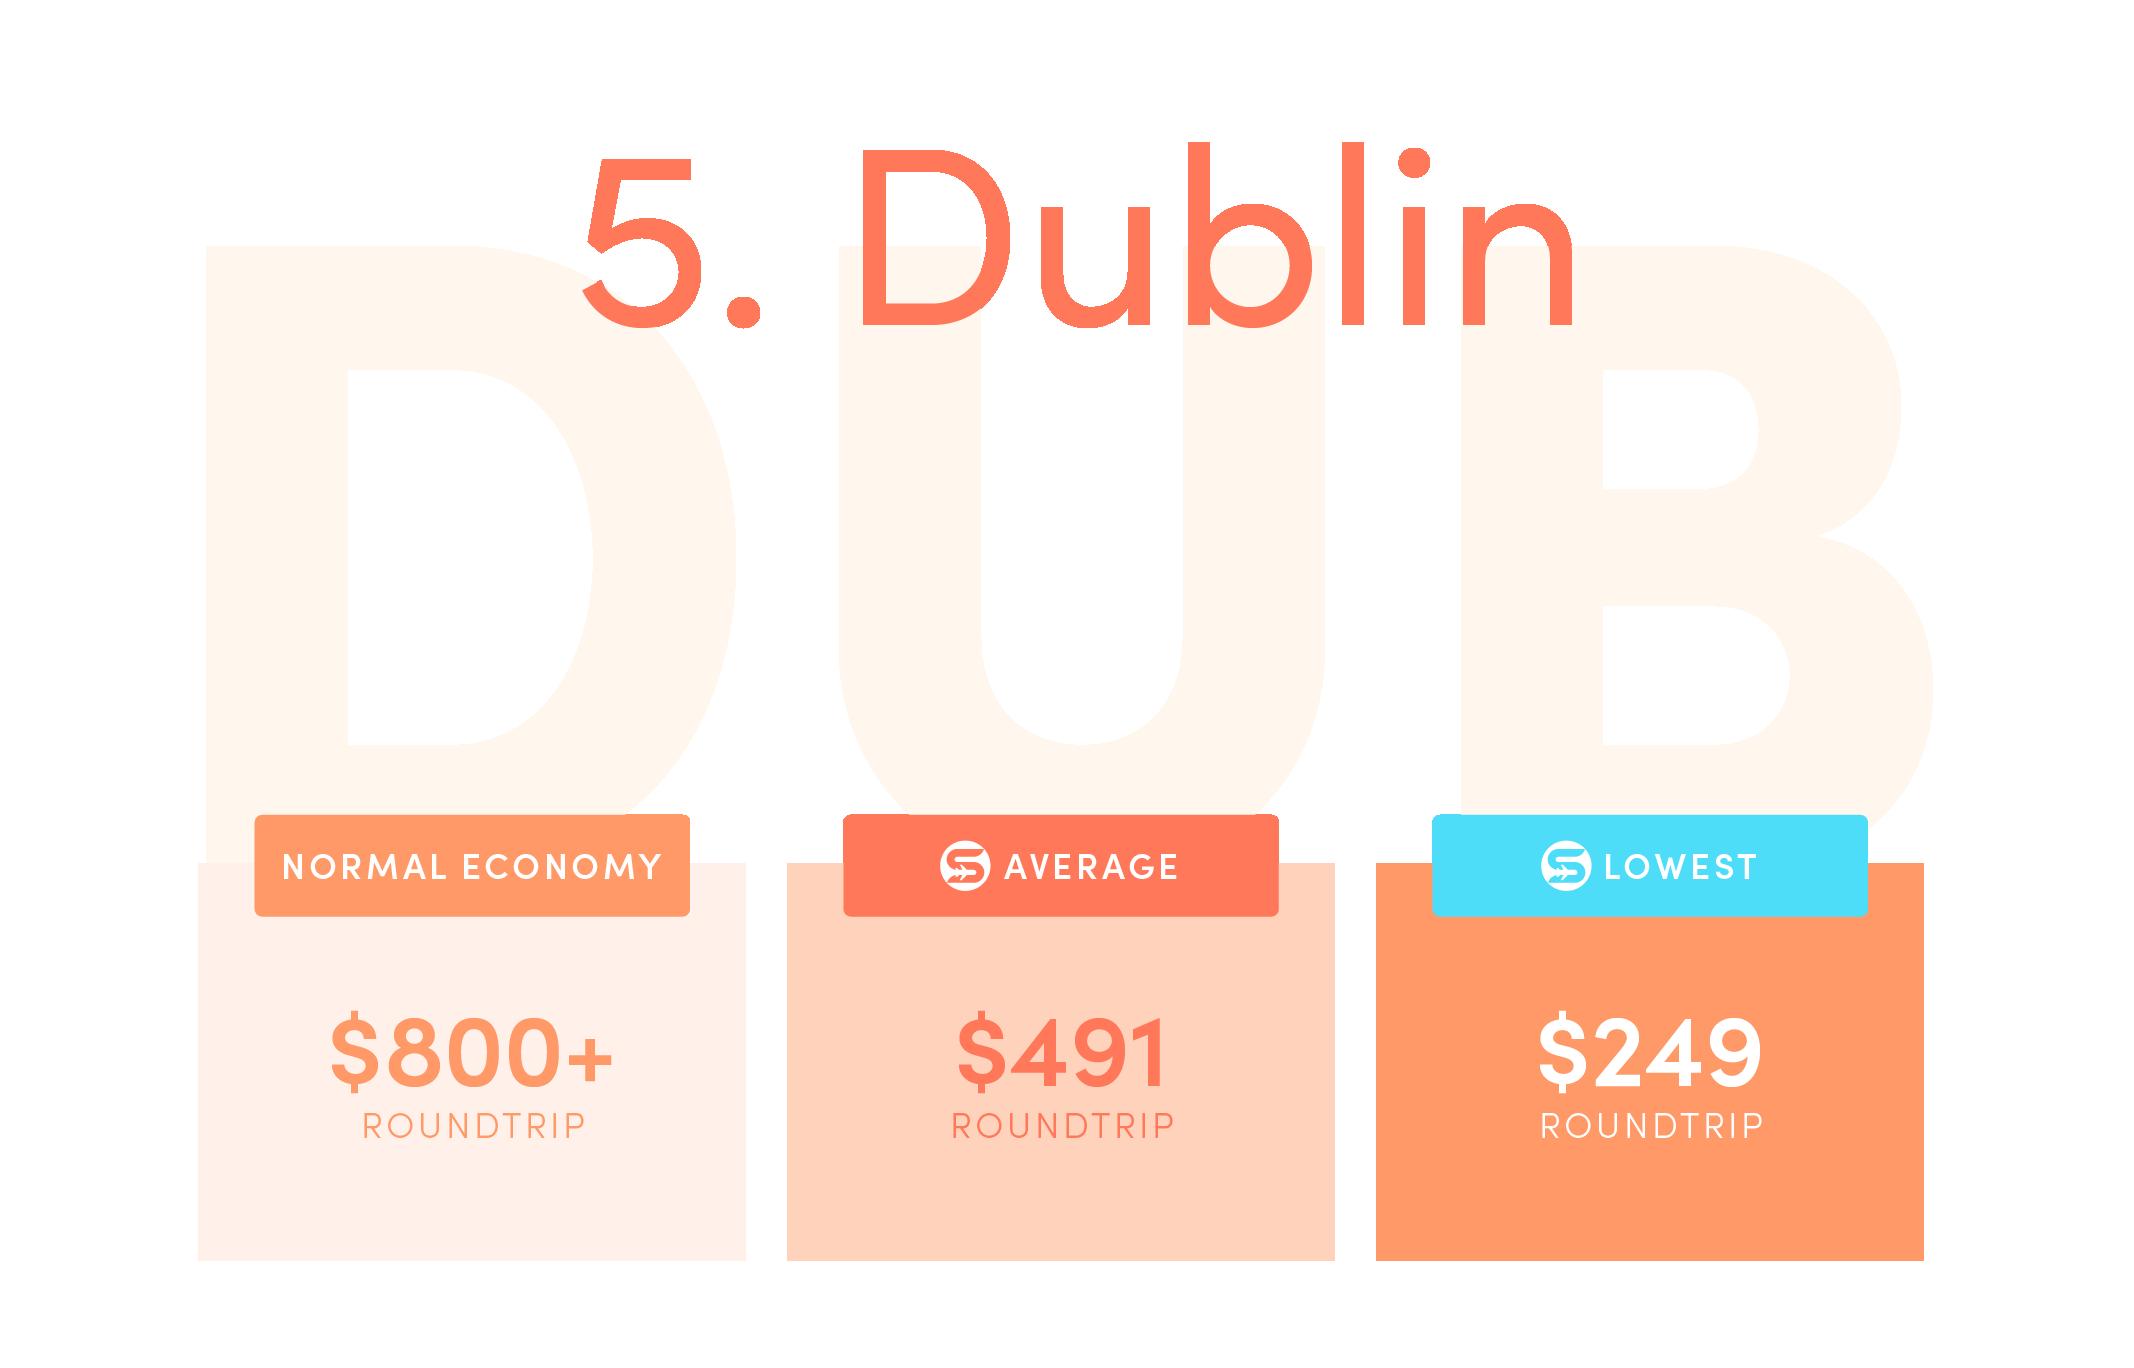 Dublin (DUB). Normal economy price from the US: $800+ roundtrip. Average Scott's Cheap Flights economy price: $491 roundtrip. Lowest Scott's Cheap Flights price in 2021: $249 roundtrip.